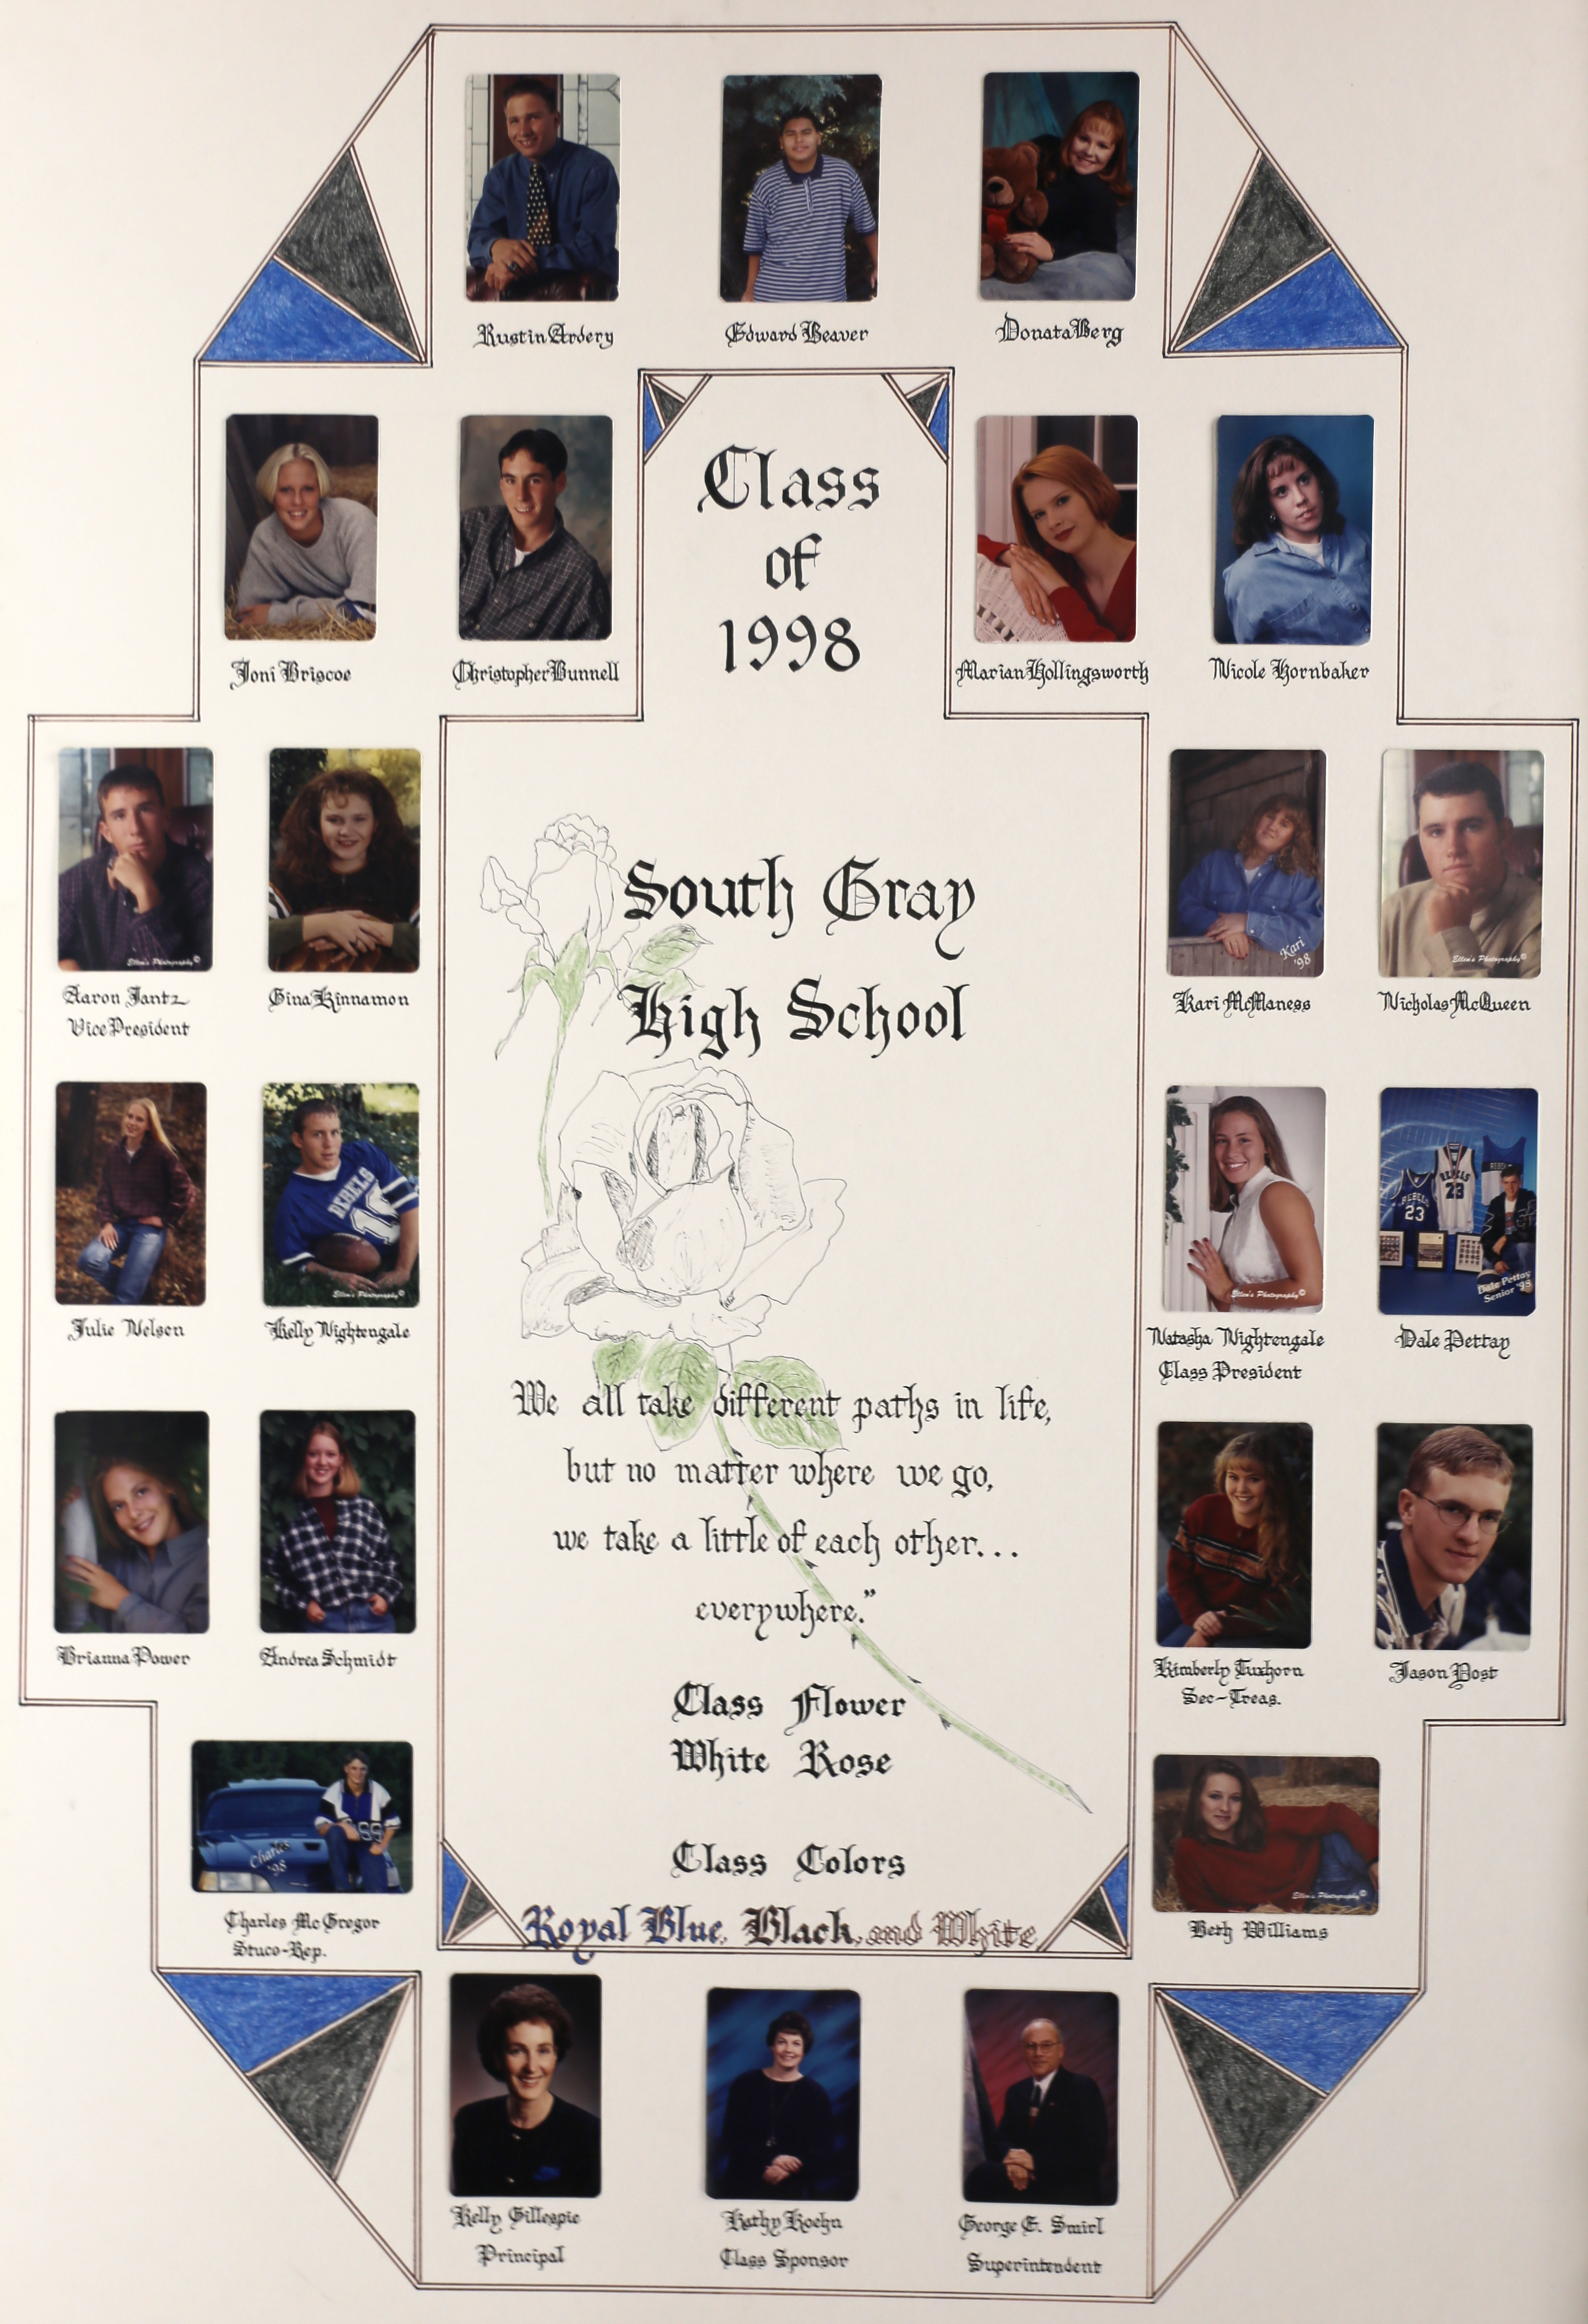 South Gray GC 1998